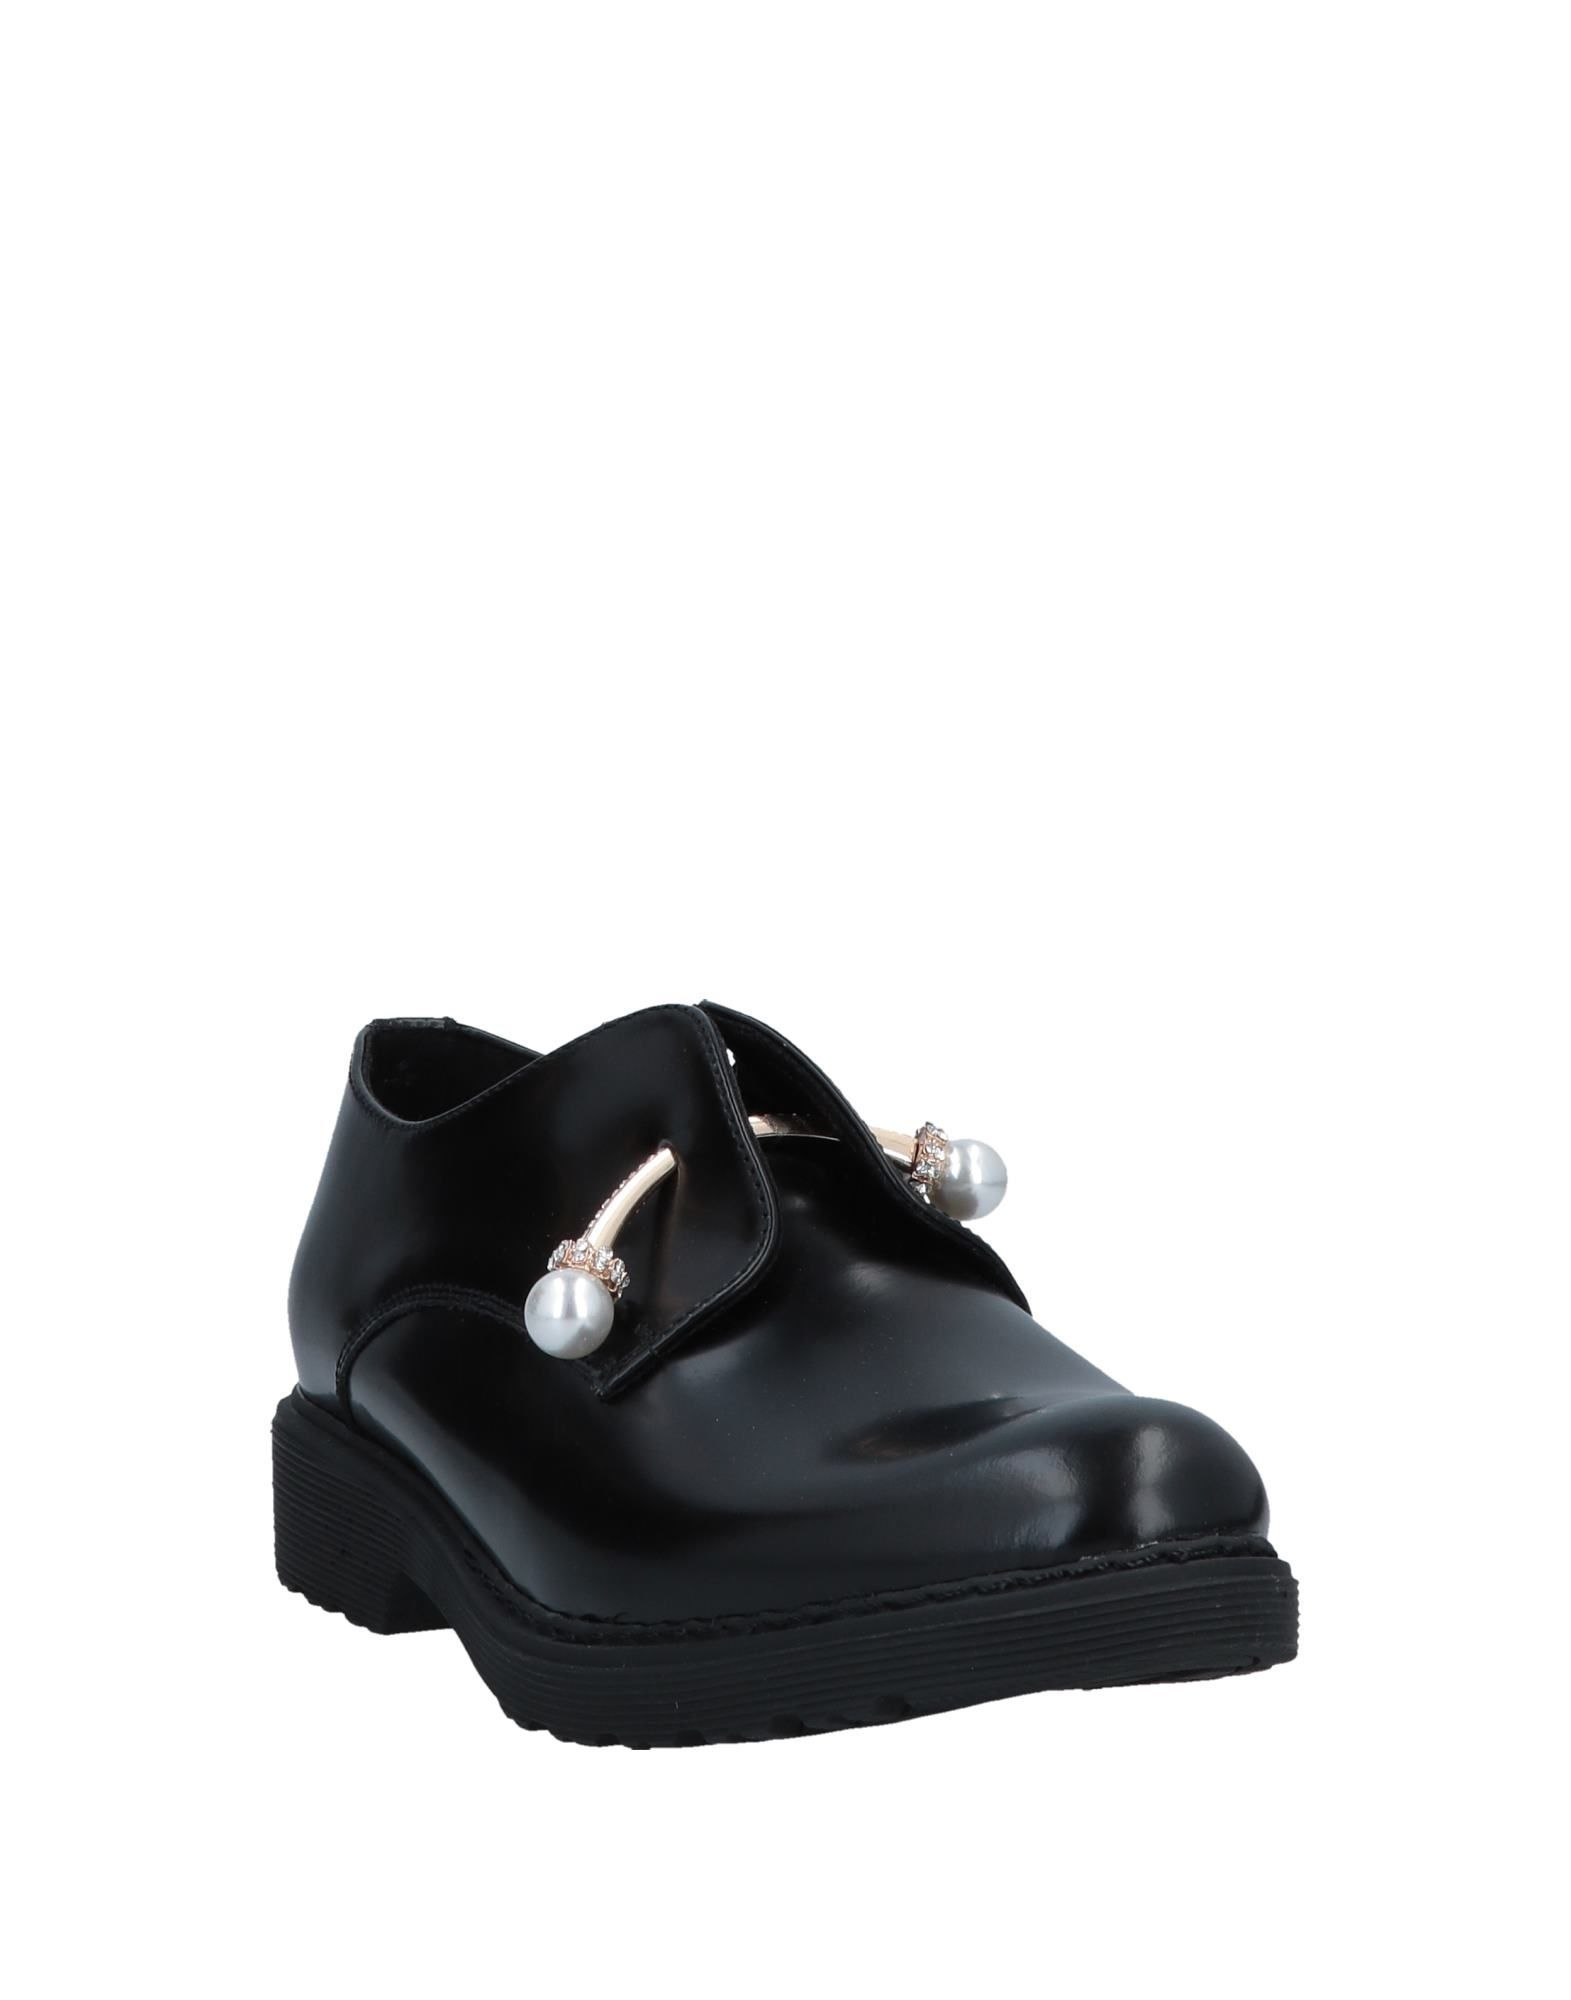 FOOTWEAR Cult Black Woman Leather